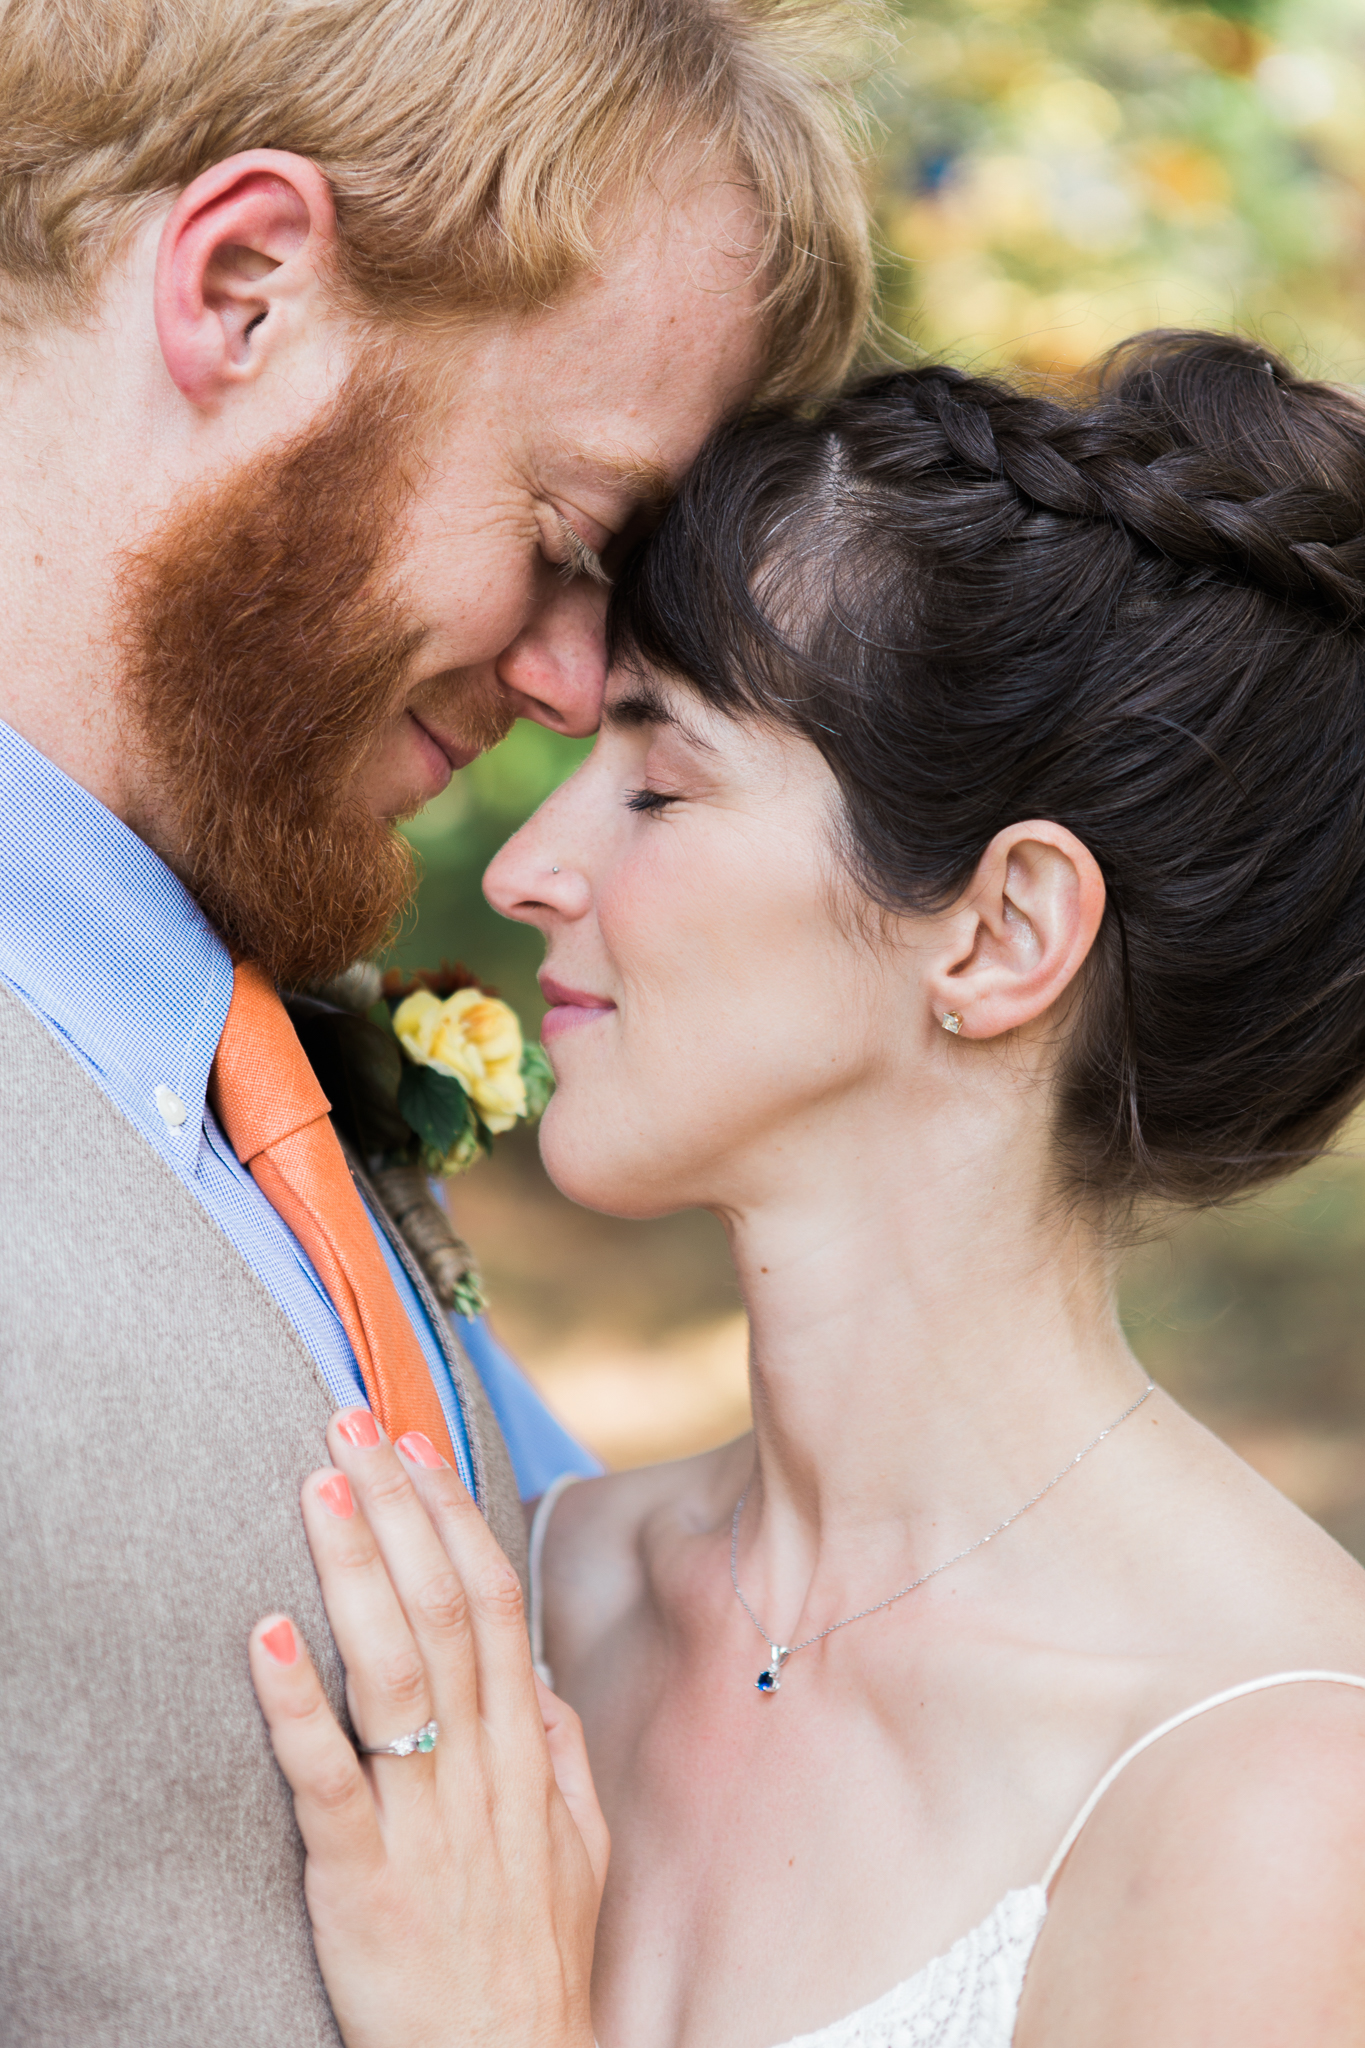 Richmond Kentucky Wedding Photographer - Ariana Jordan Photography -29-2.jpg